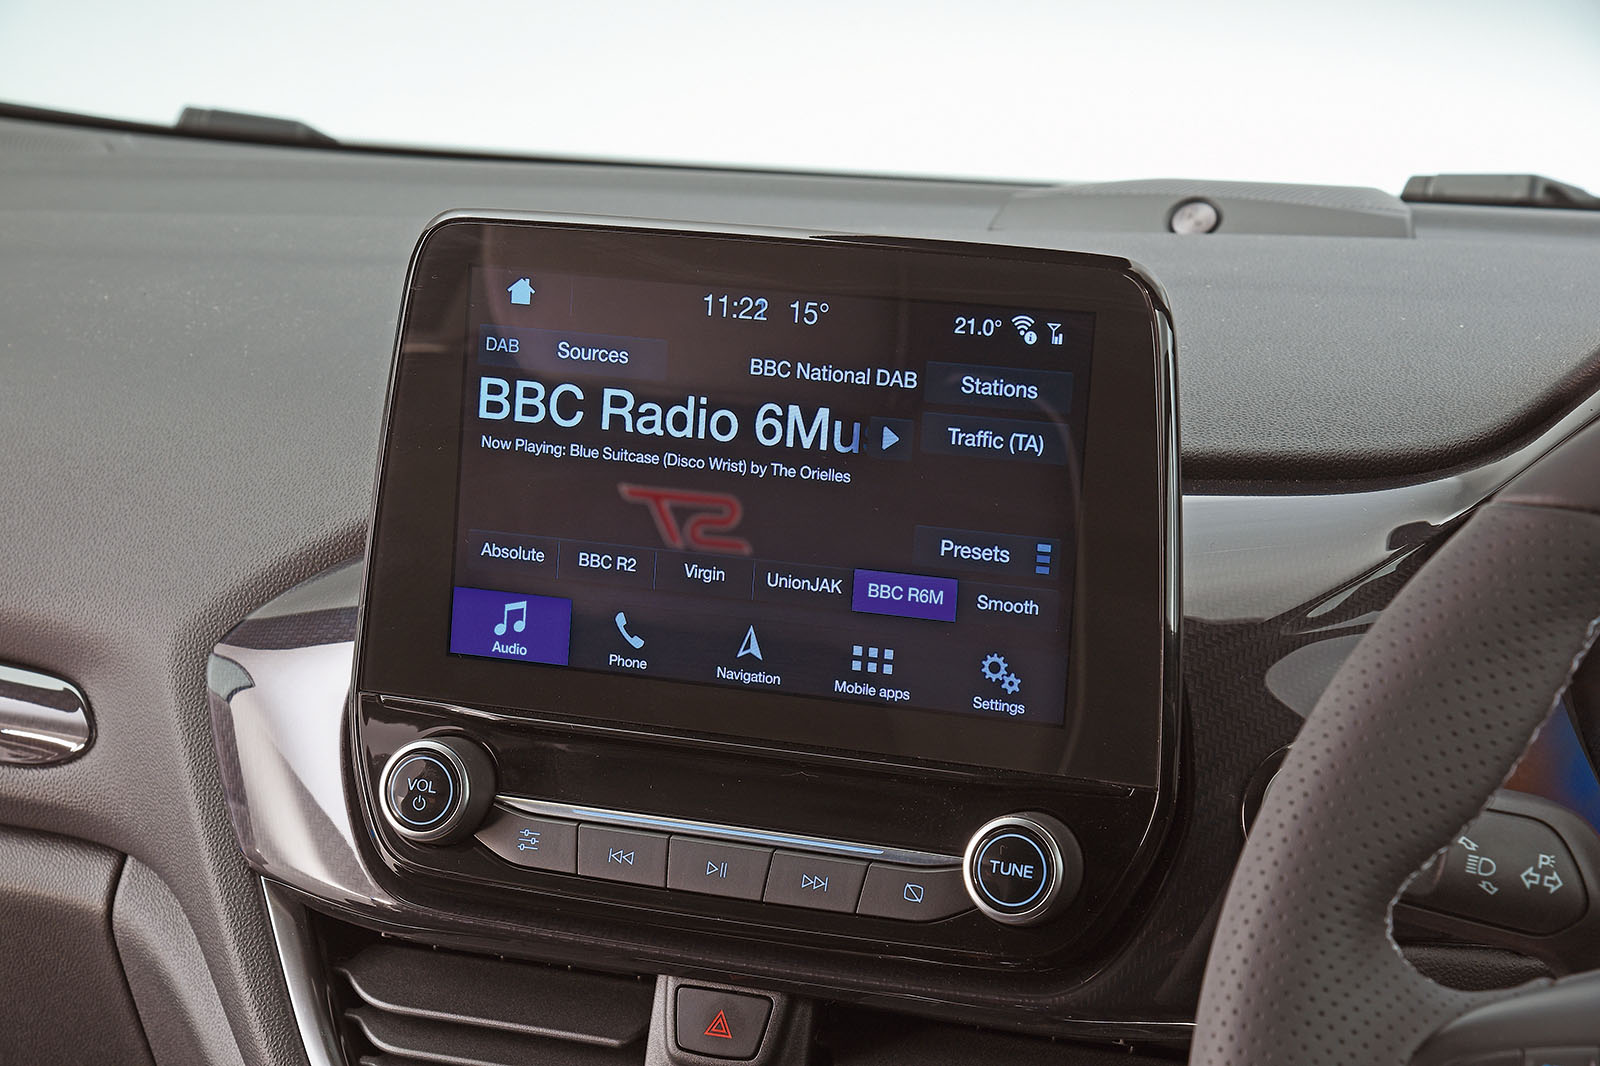 2018 Ford Fiesta ST infotainment